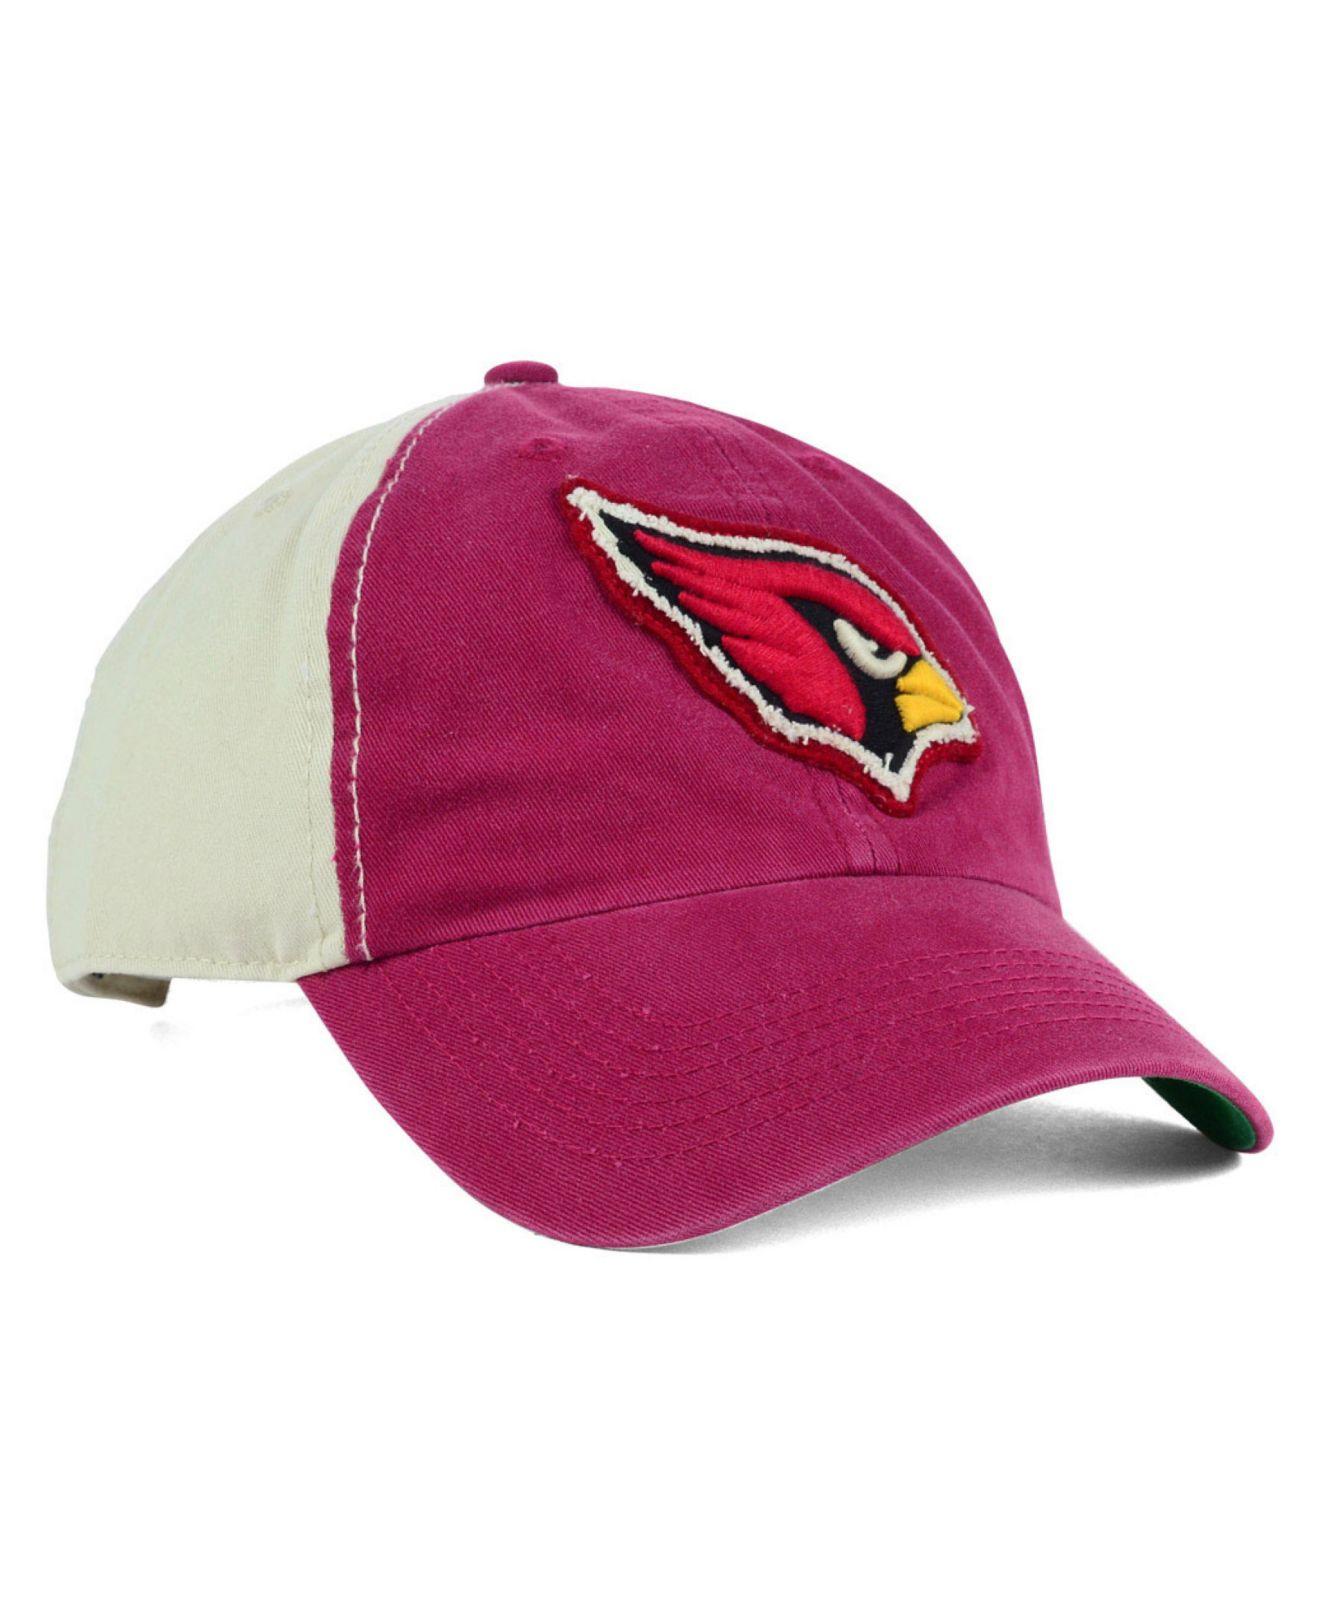 5daab5794 Lyst - 47 Brand Arizona Cardinals Nfl Derby Clean Up Cap in Purple ...